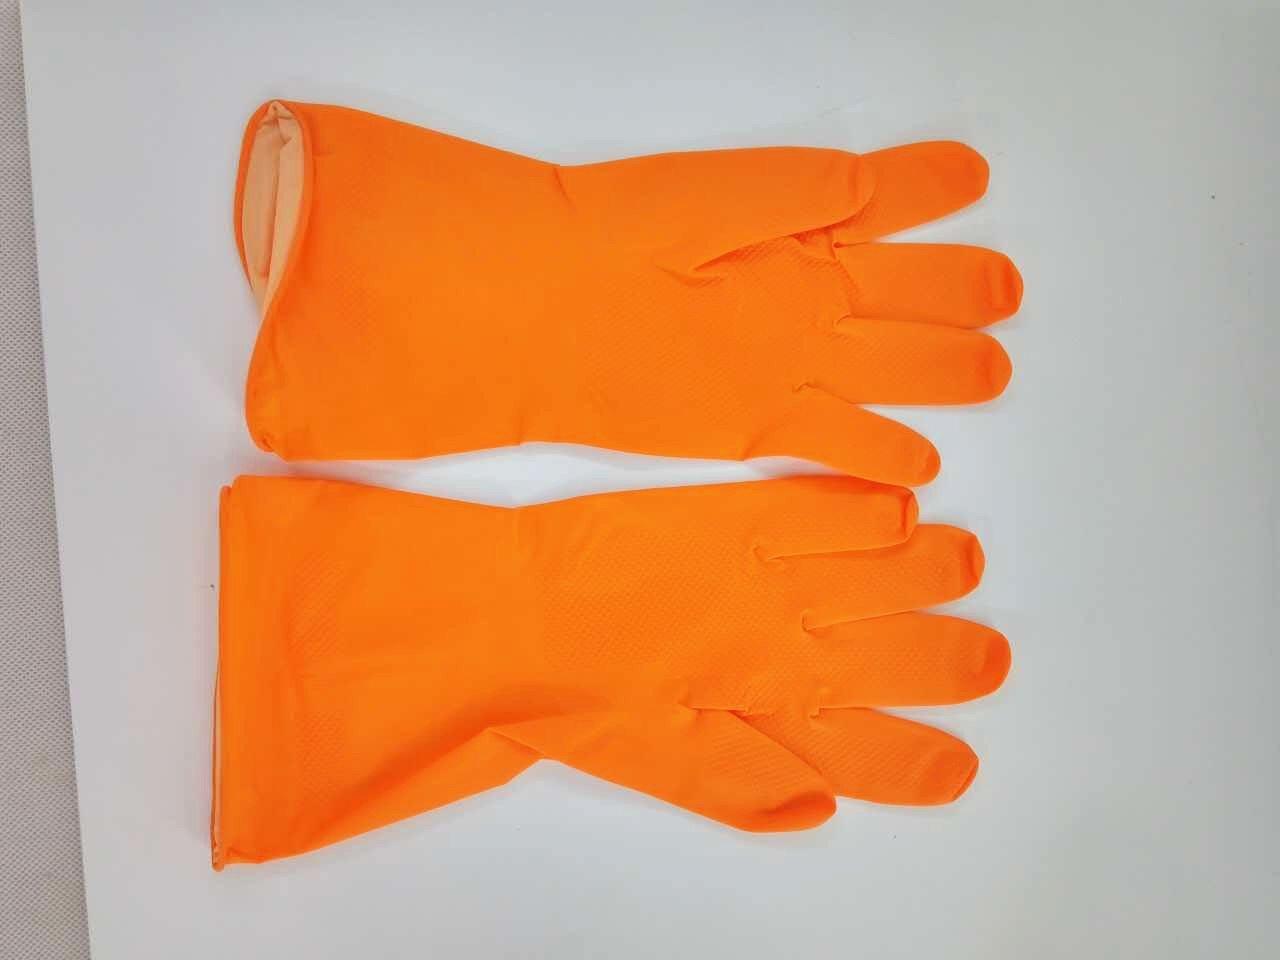 FixtureDisplays 3ペアflock-linedラテックス家庭用キッチンクリーニングDishwashingゴム手袋、クリーニング手袋、大、オレンジ16781-l-orange-nf B0776SWG9Y